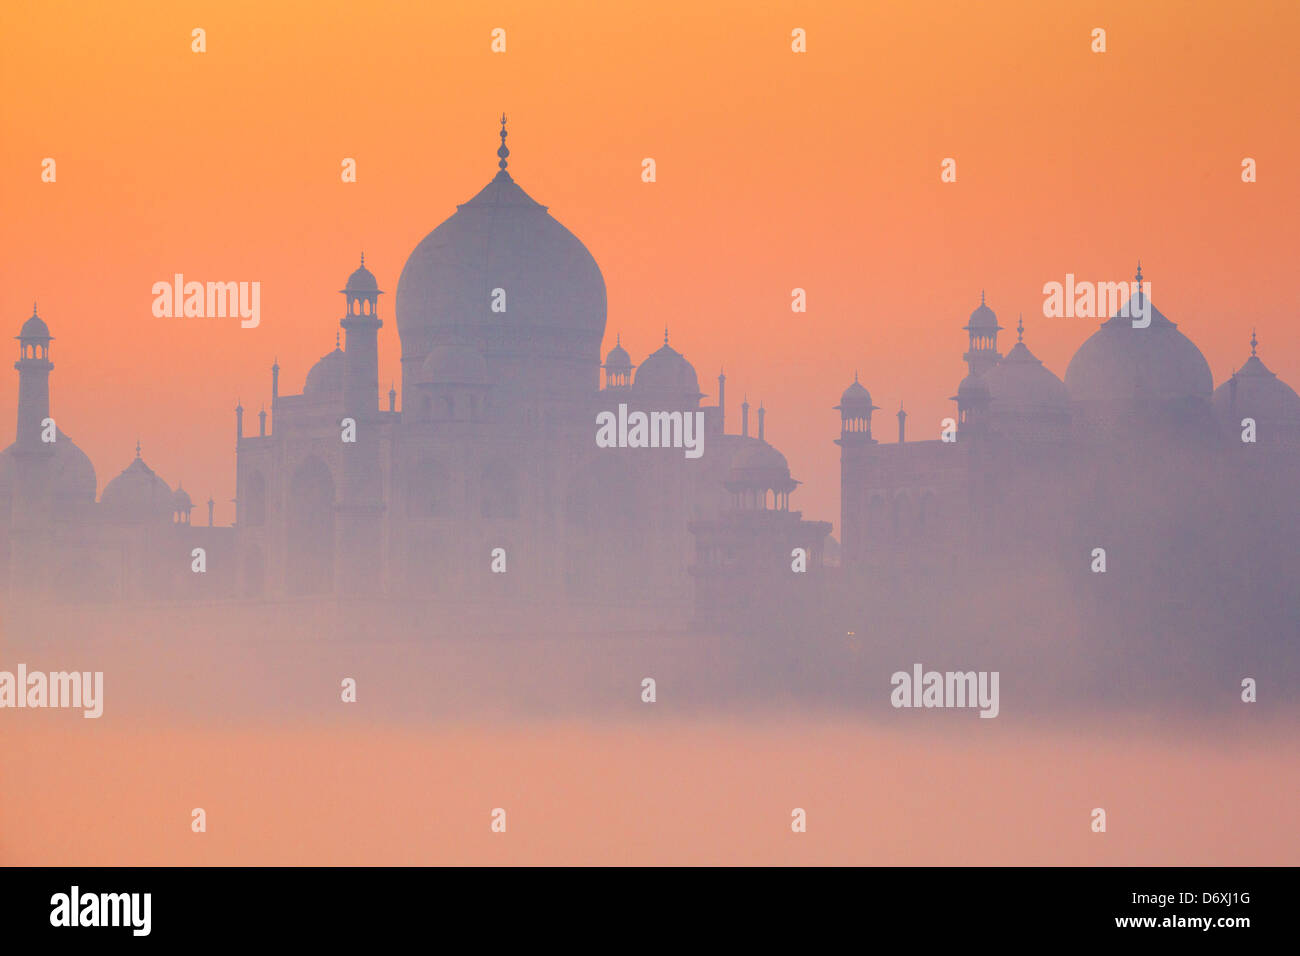 Horizonte de Taj Mahal al amanecer, Agra, Uttar Pradesh, India Imagen De Stock